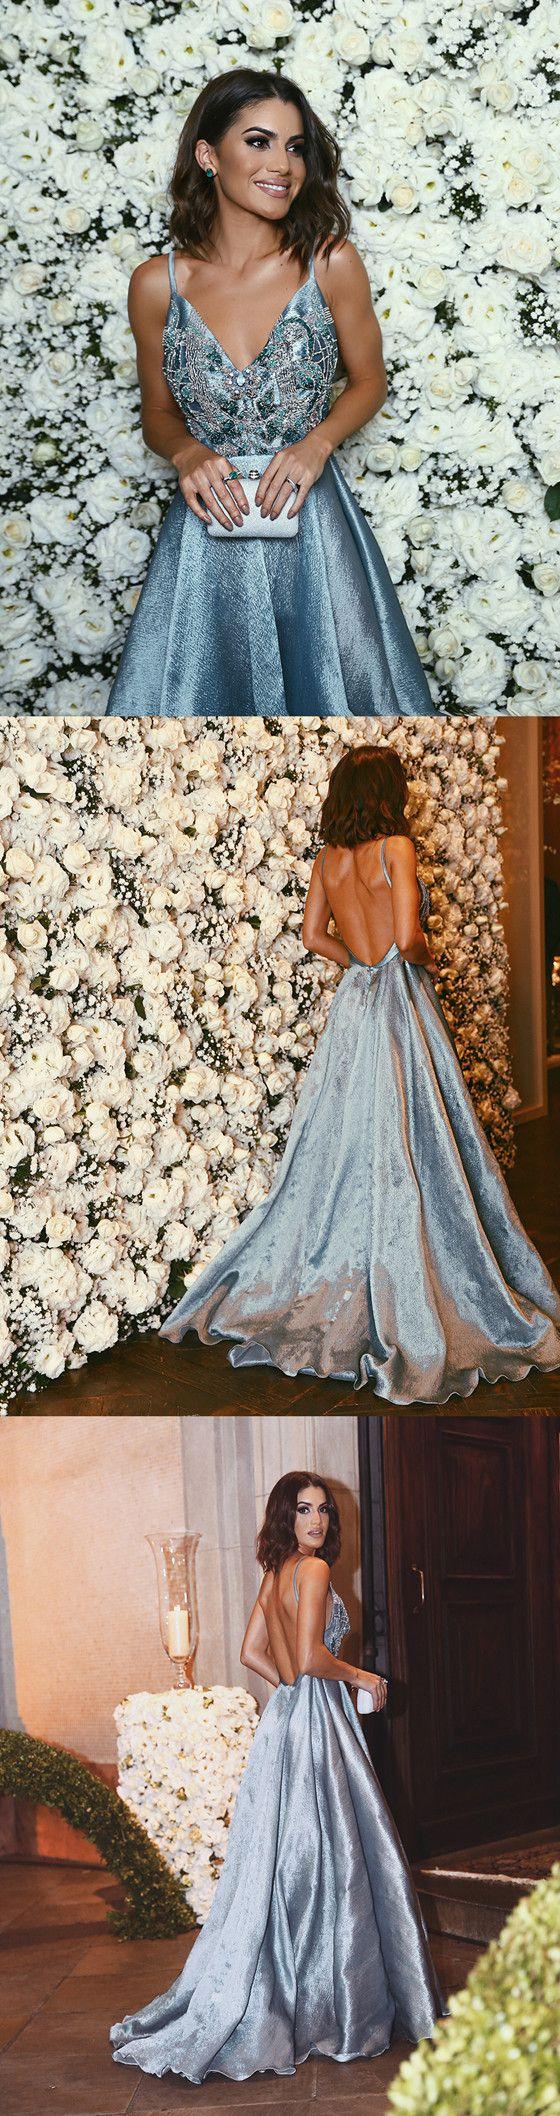 Luxurious A-line Straps Blue Formal Evening Dress,Sexy Backless Beaded Deep V Neckline prom dresses, PD0497